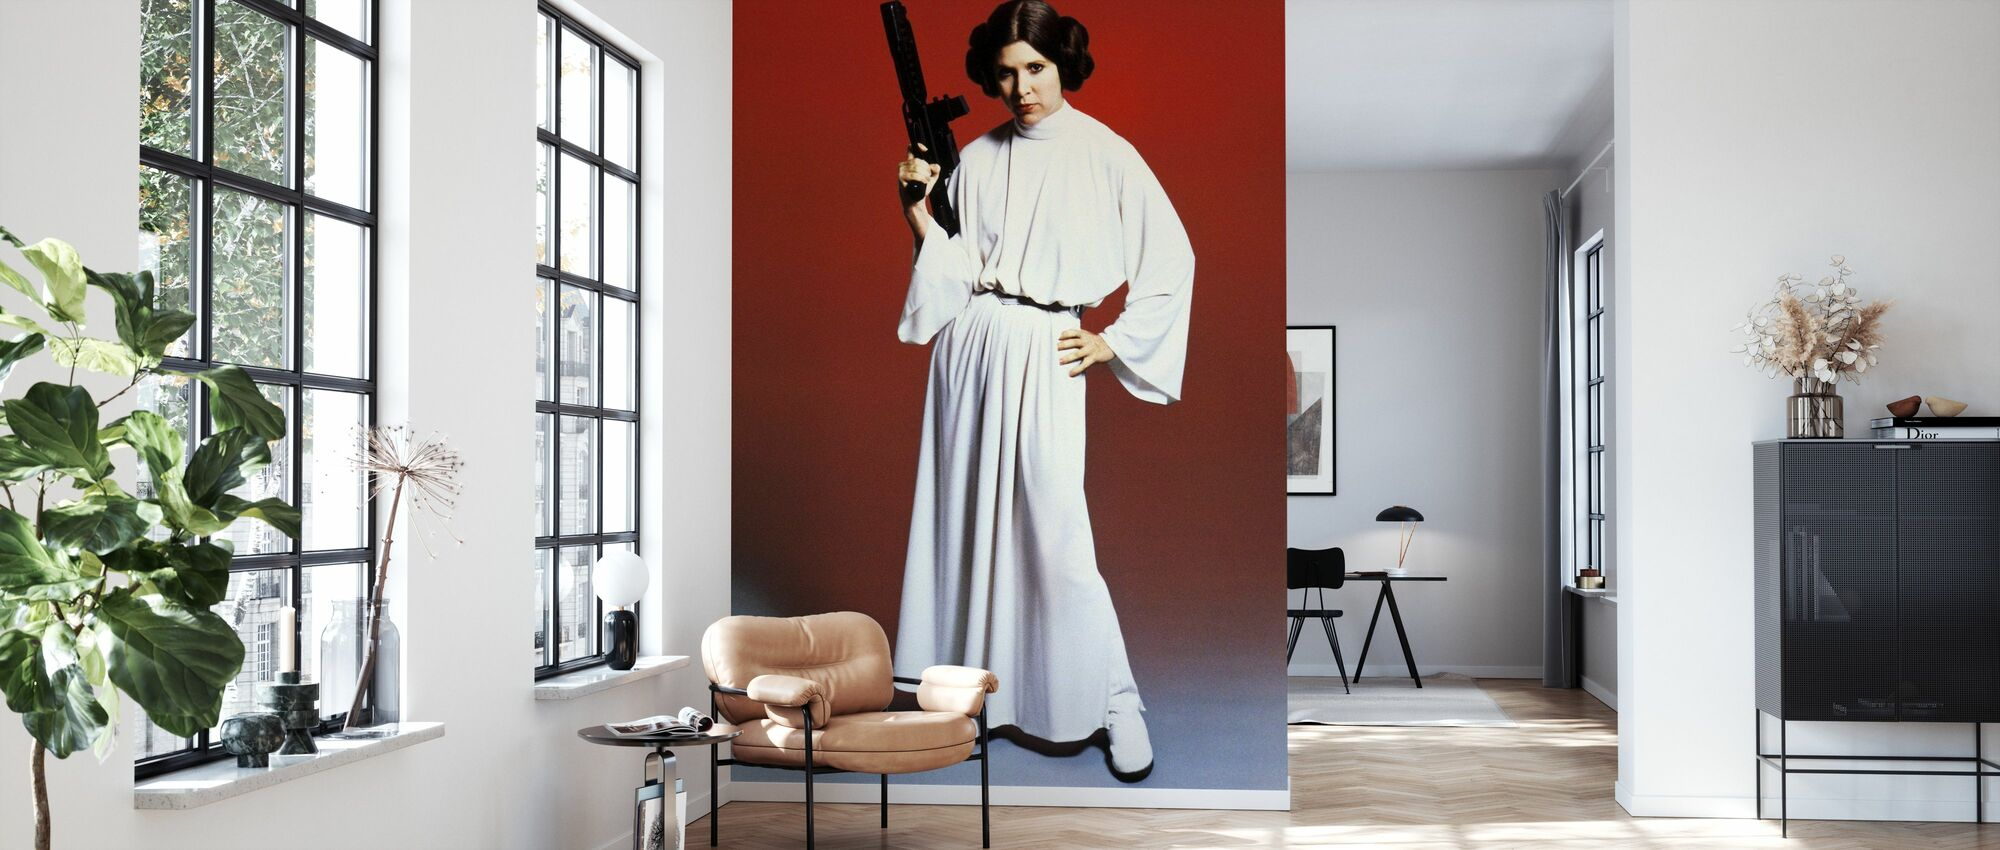 Star Wars - Prinsesse Leia våben - Tapet - Stue